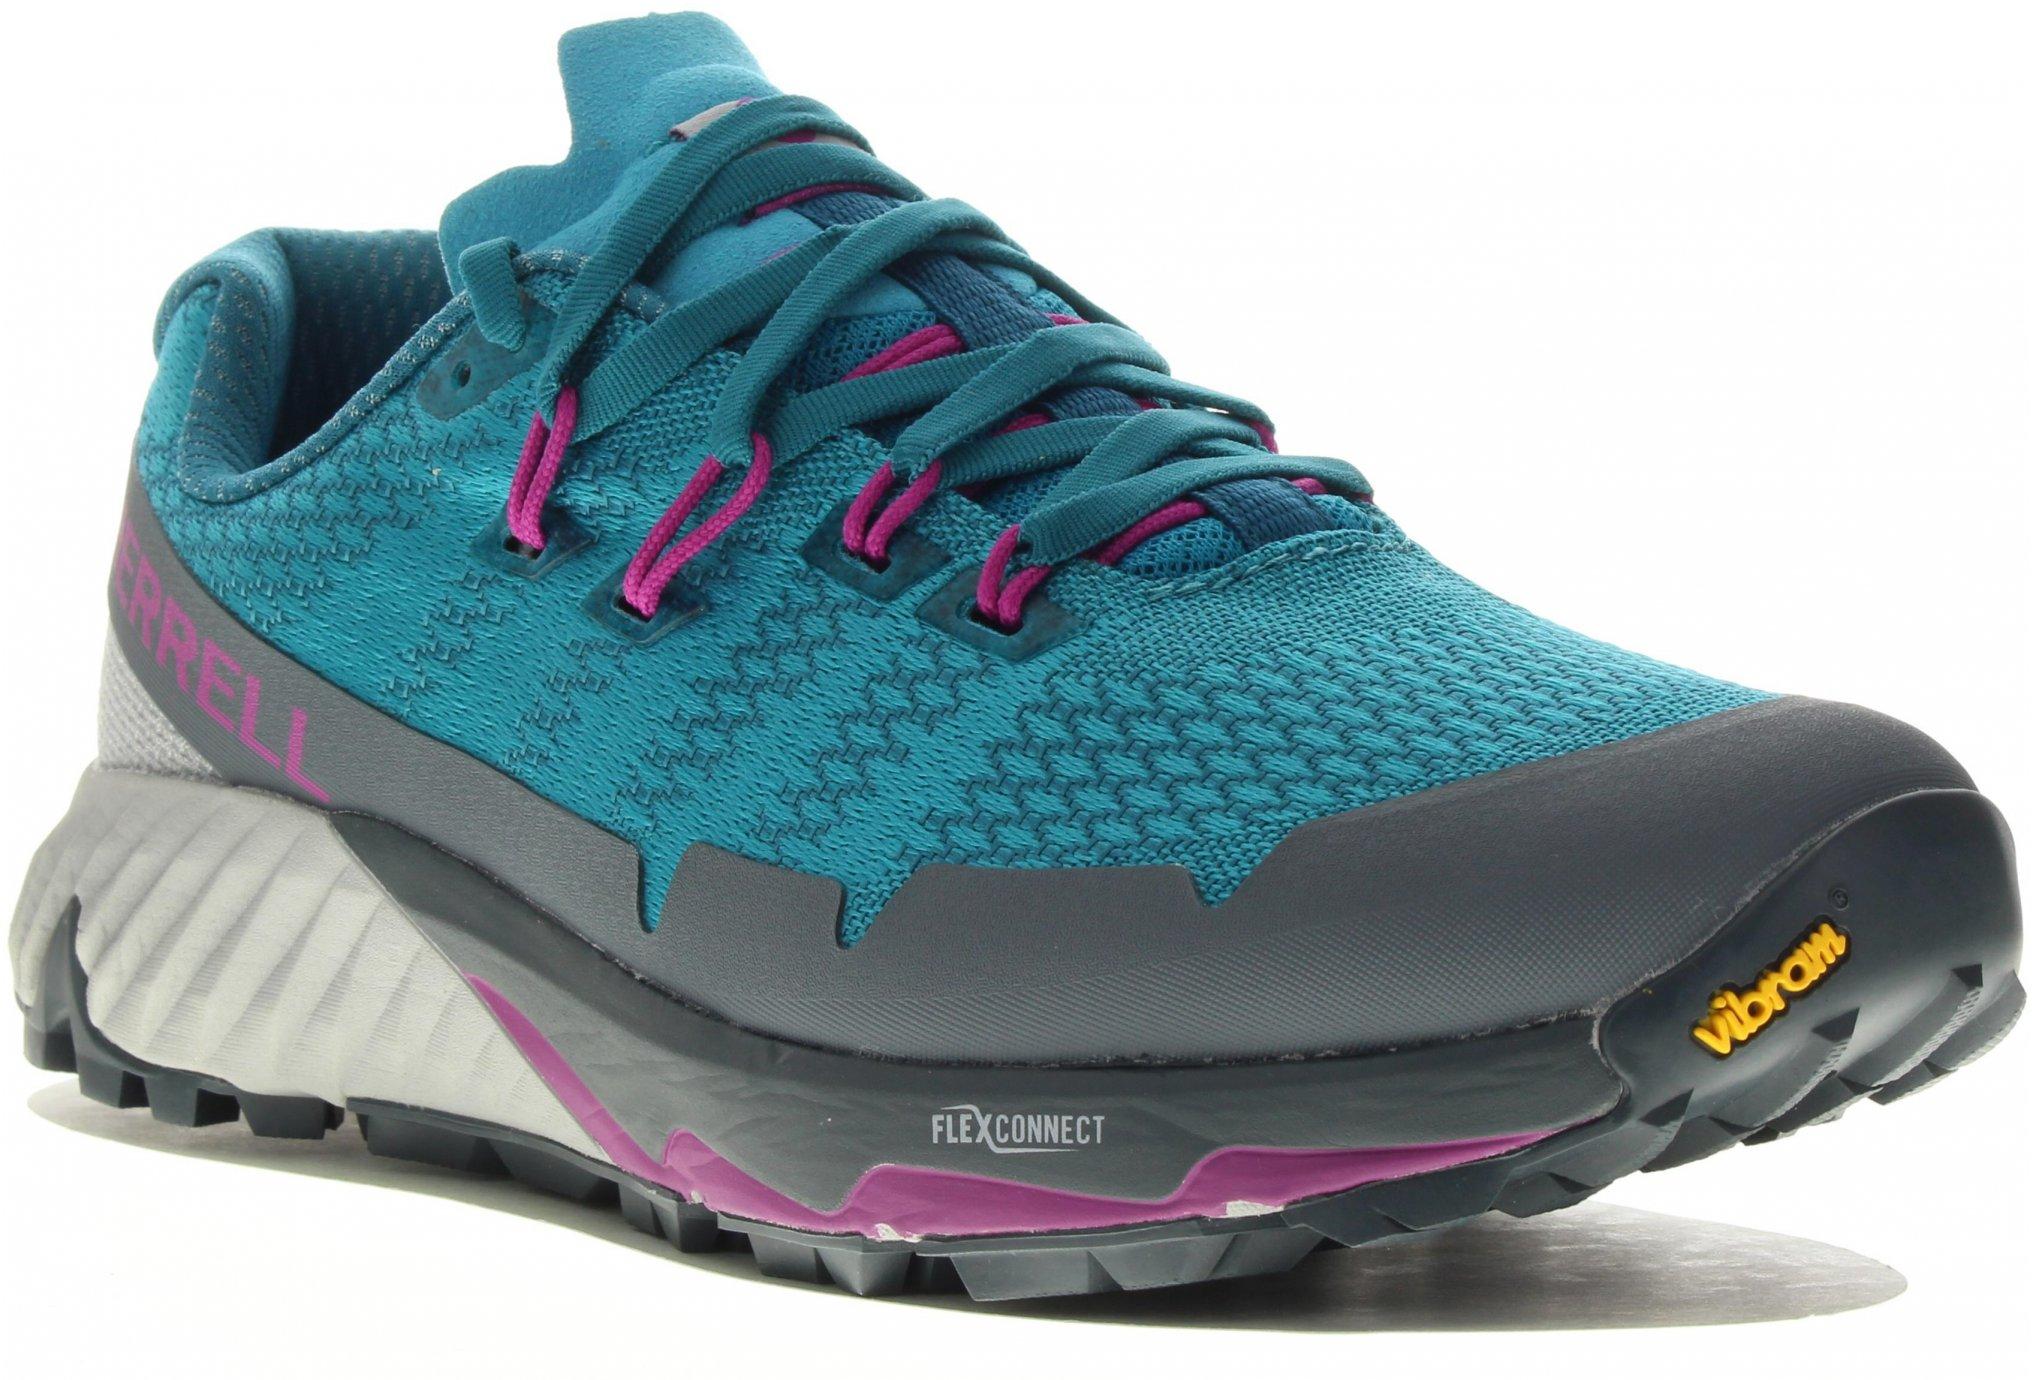 W Chaussures Flex Running 3 Merrell Trails Femme Peak Agility tsQxhCdr